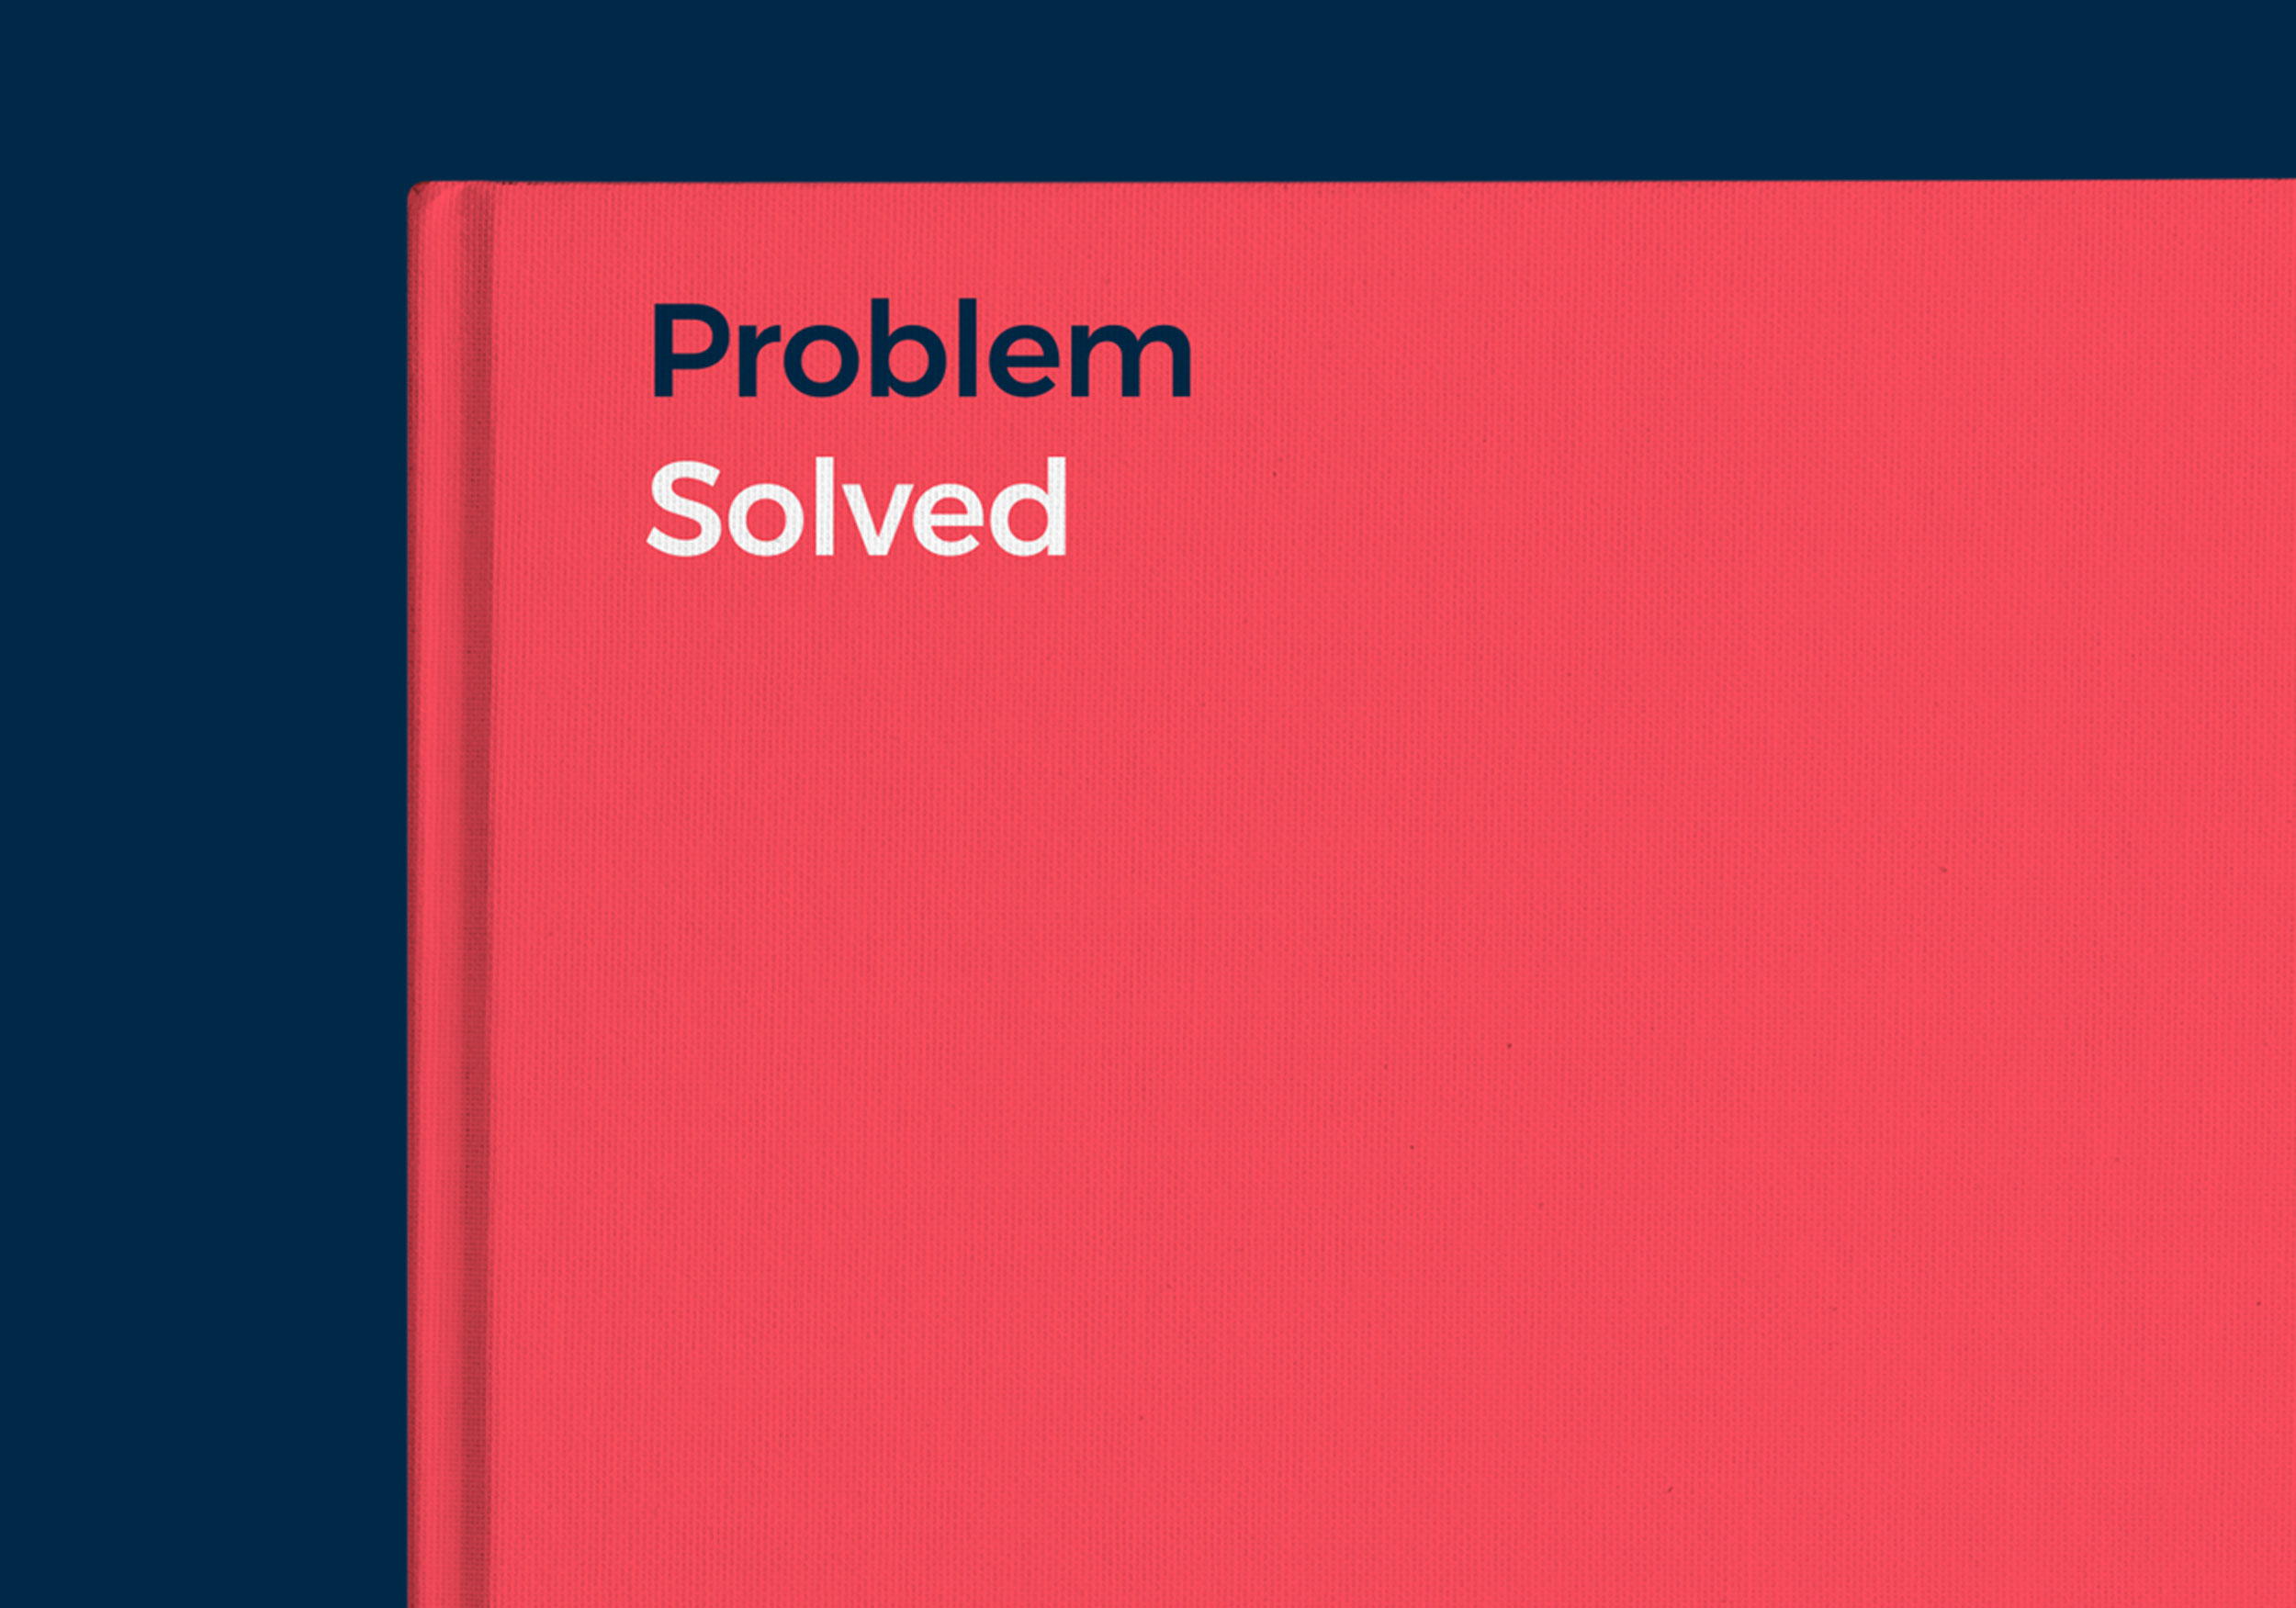 problem solved branding